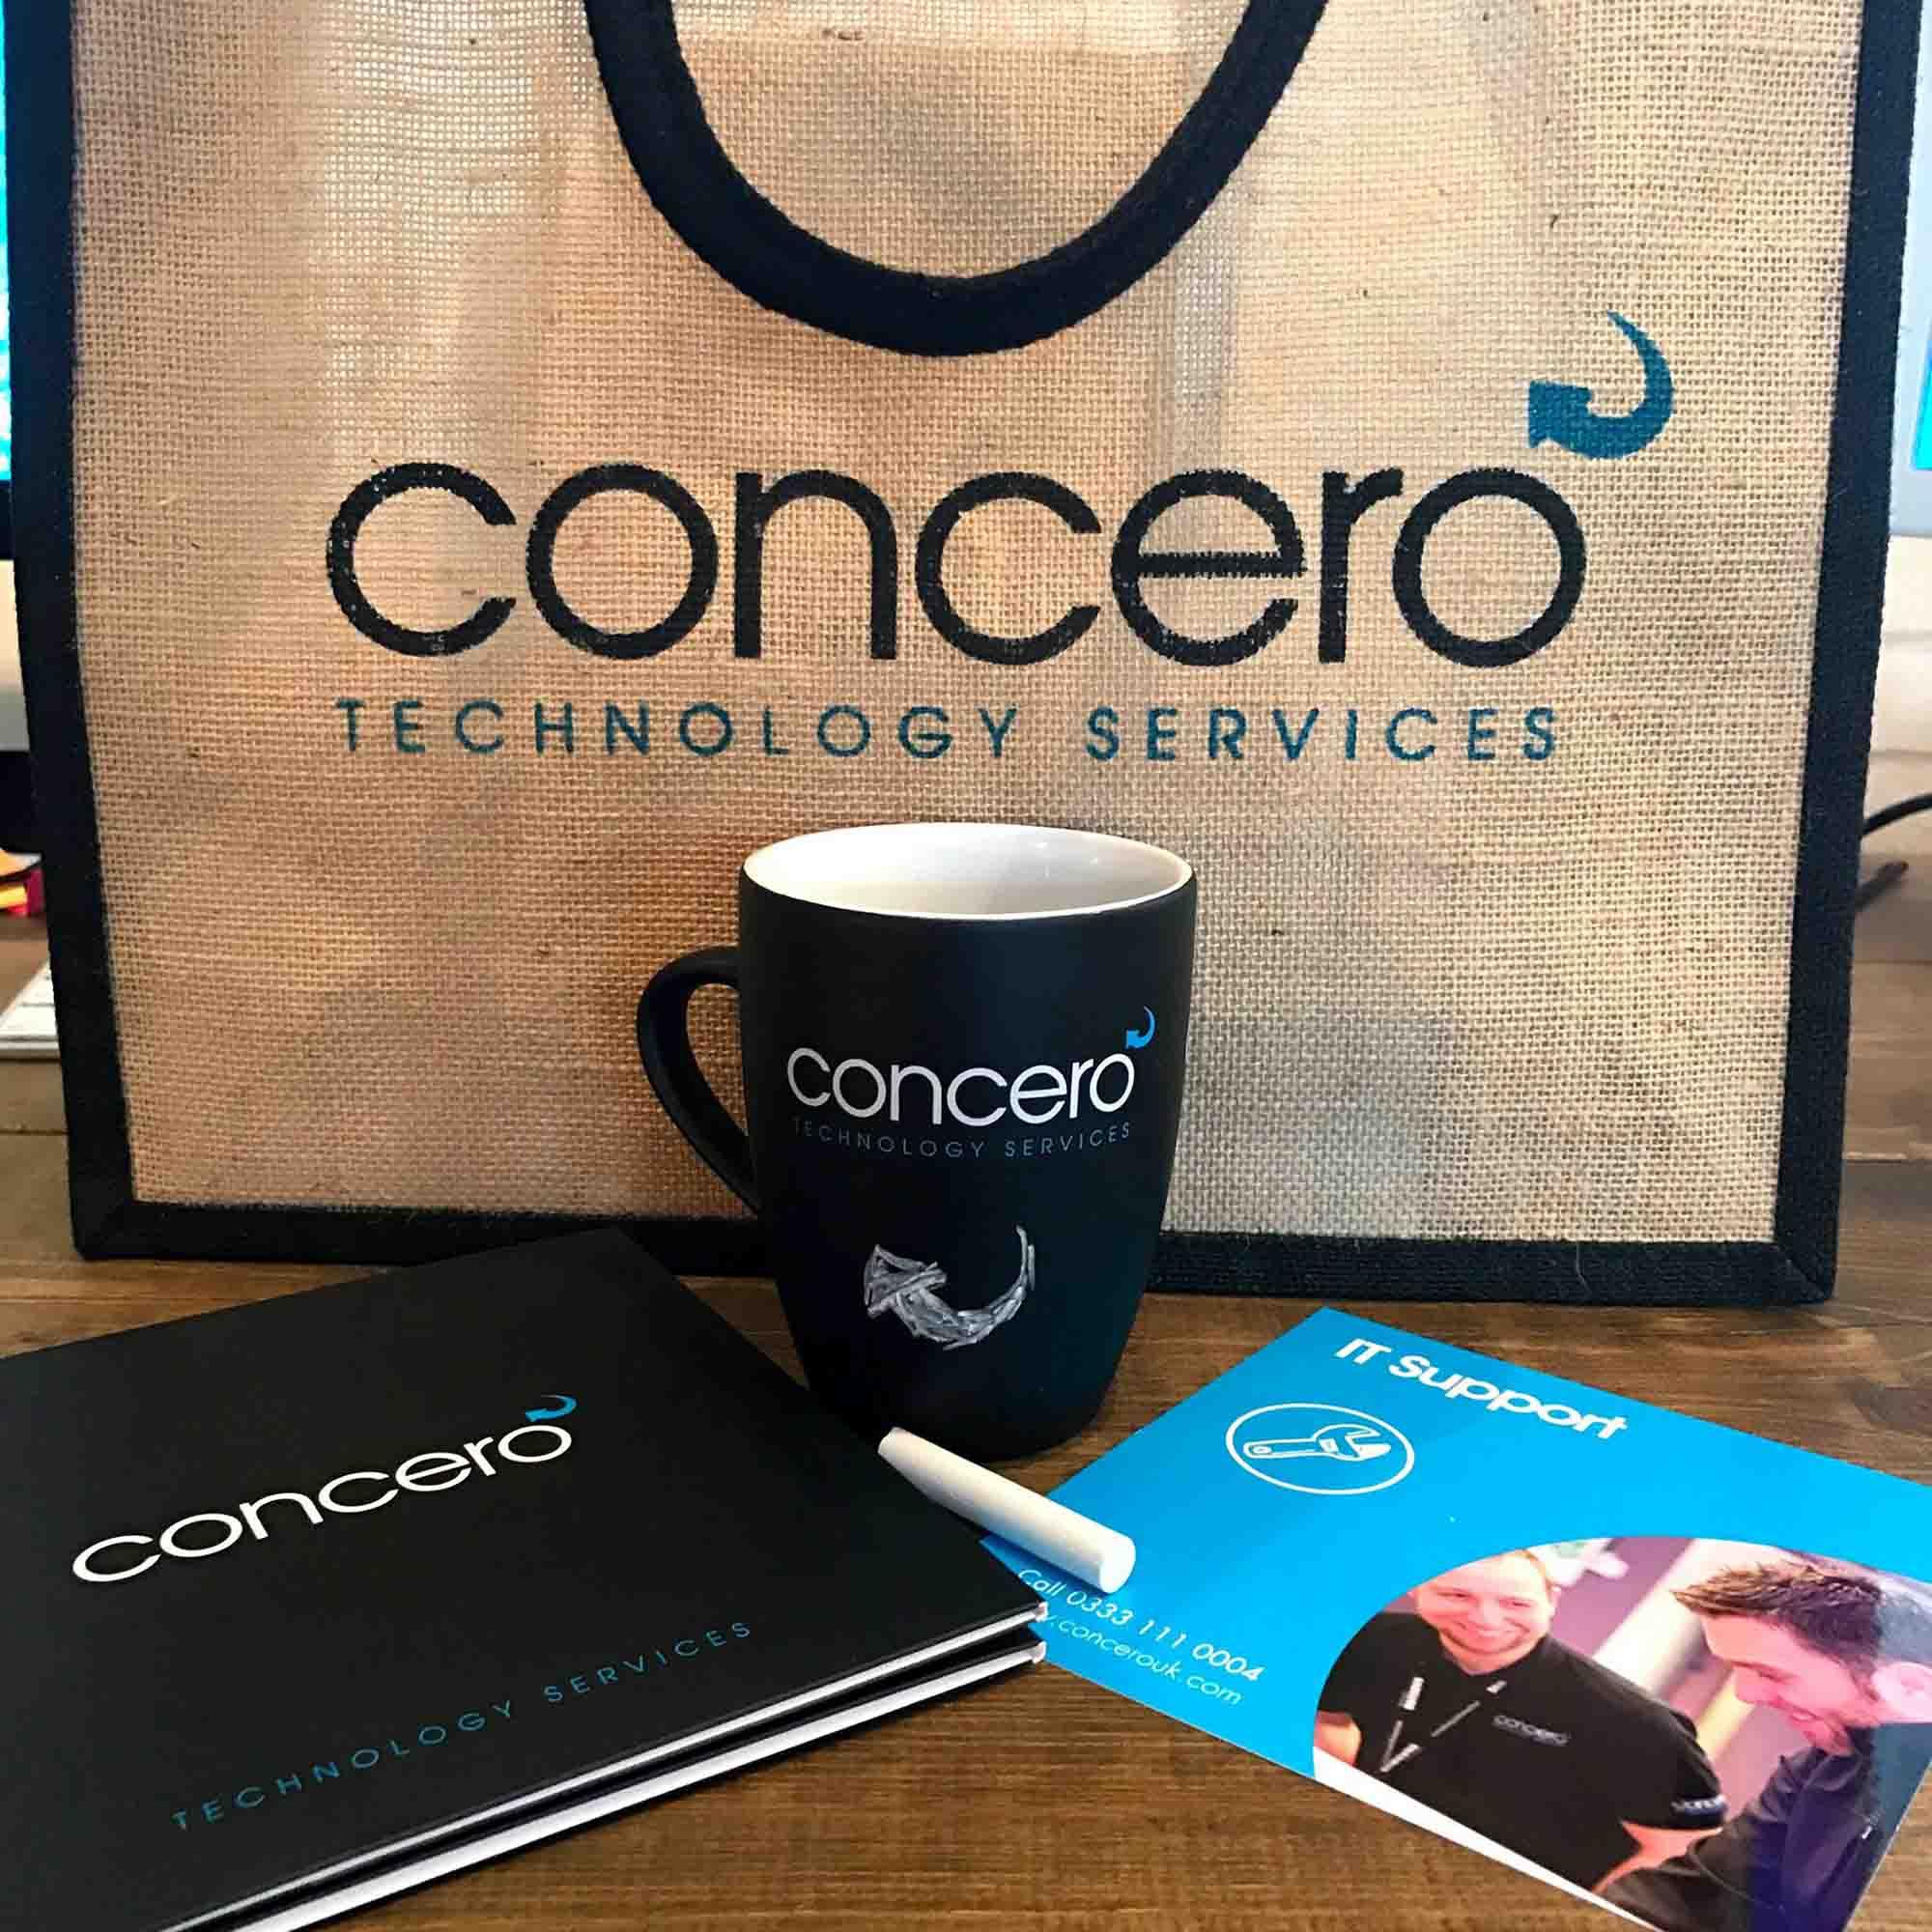 Concero Technology Services